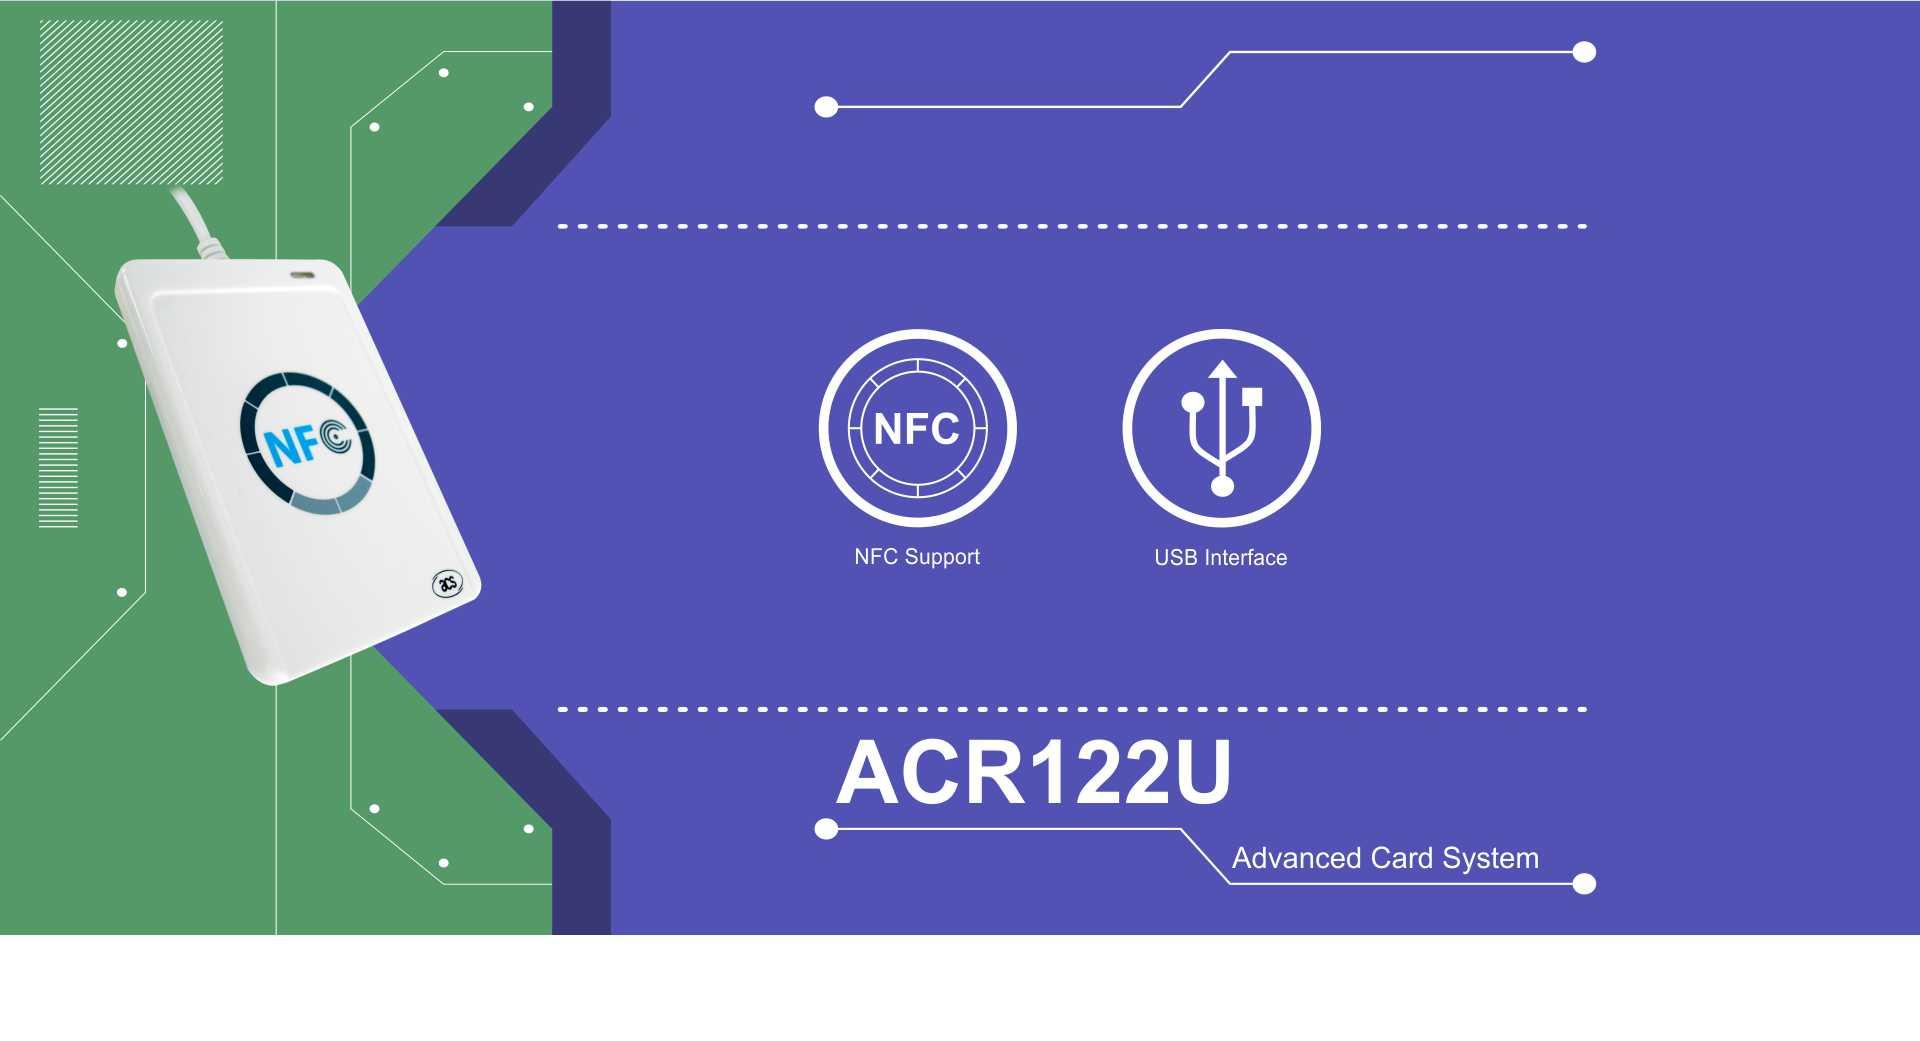 ACR122U